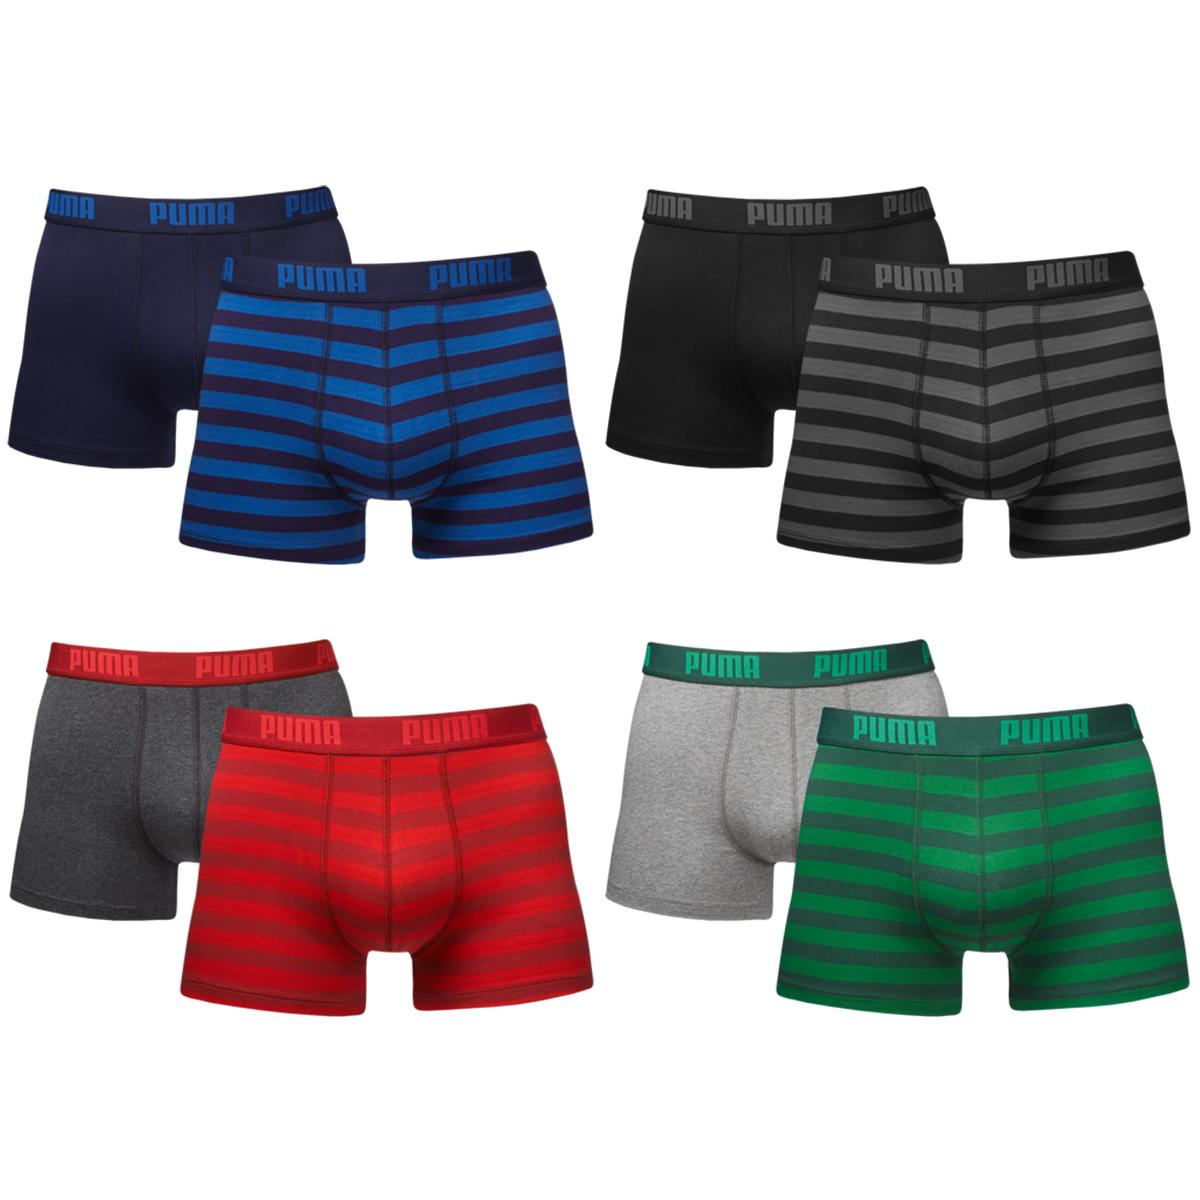 puma 2er pack striped 1515 boxers boxershorts boxer short herren unterhose s xl ebay. Black Bedroom Furniture Sets. Home Design Ideas